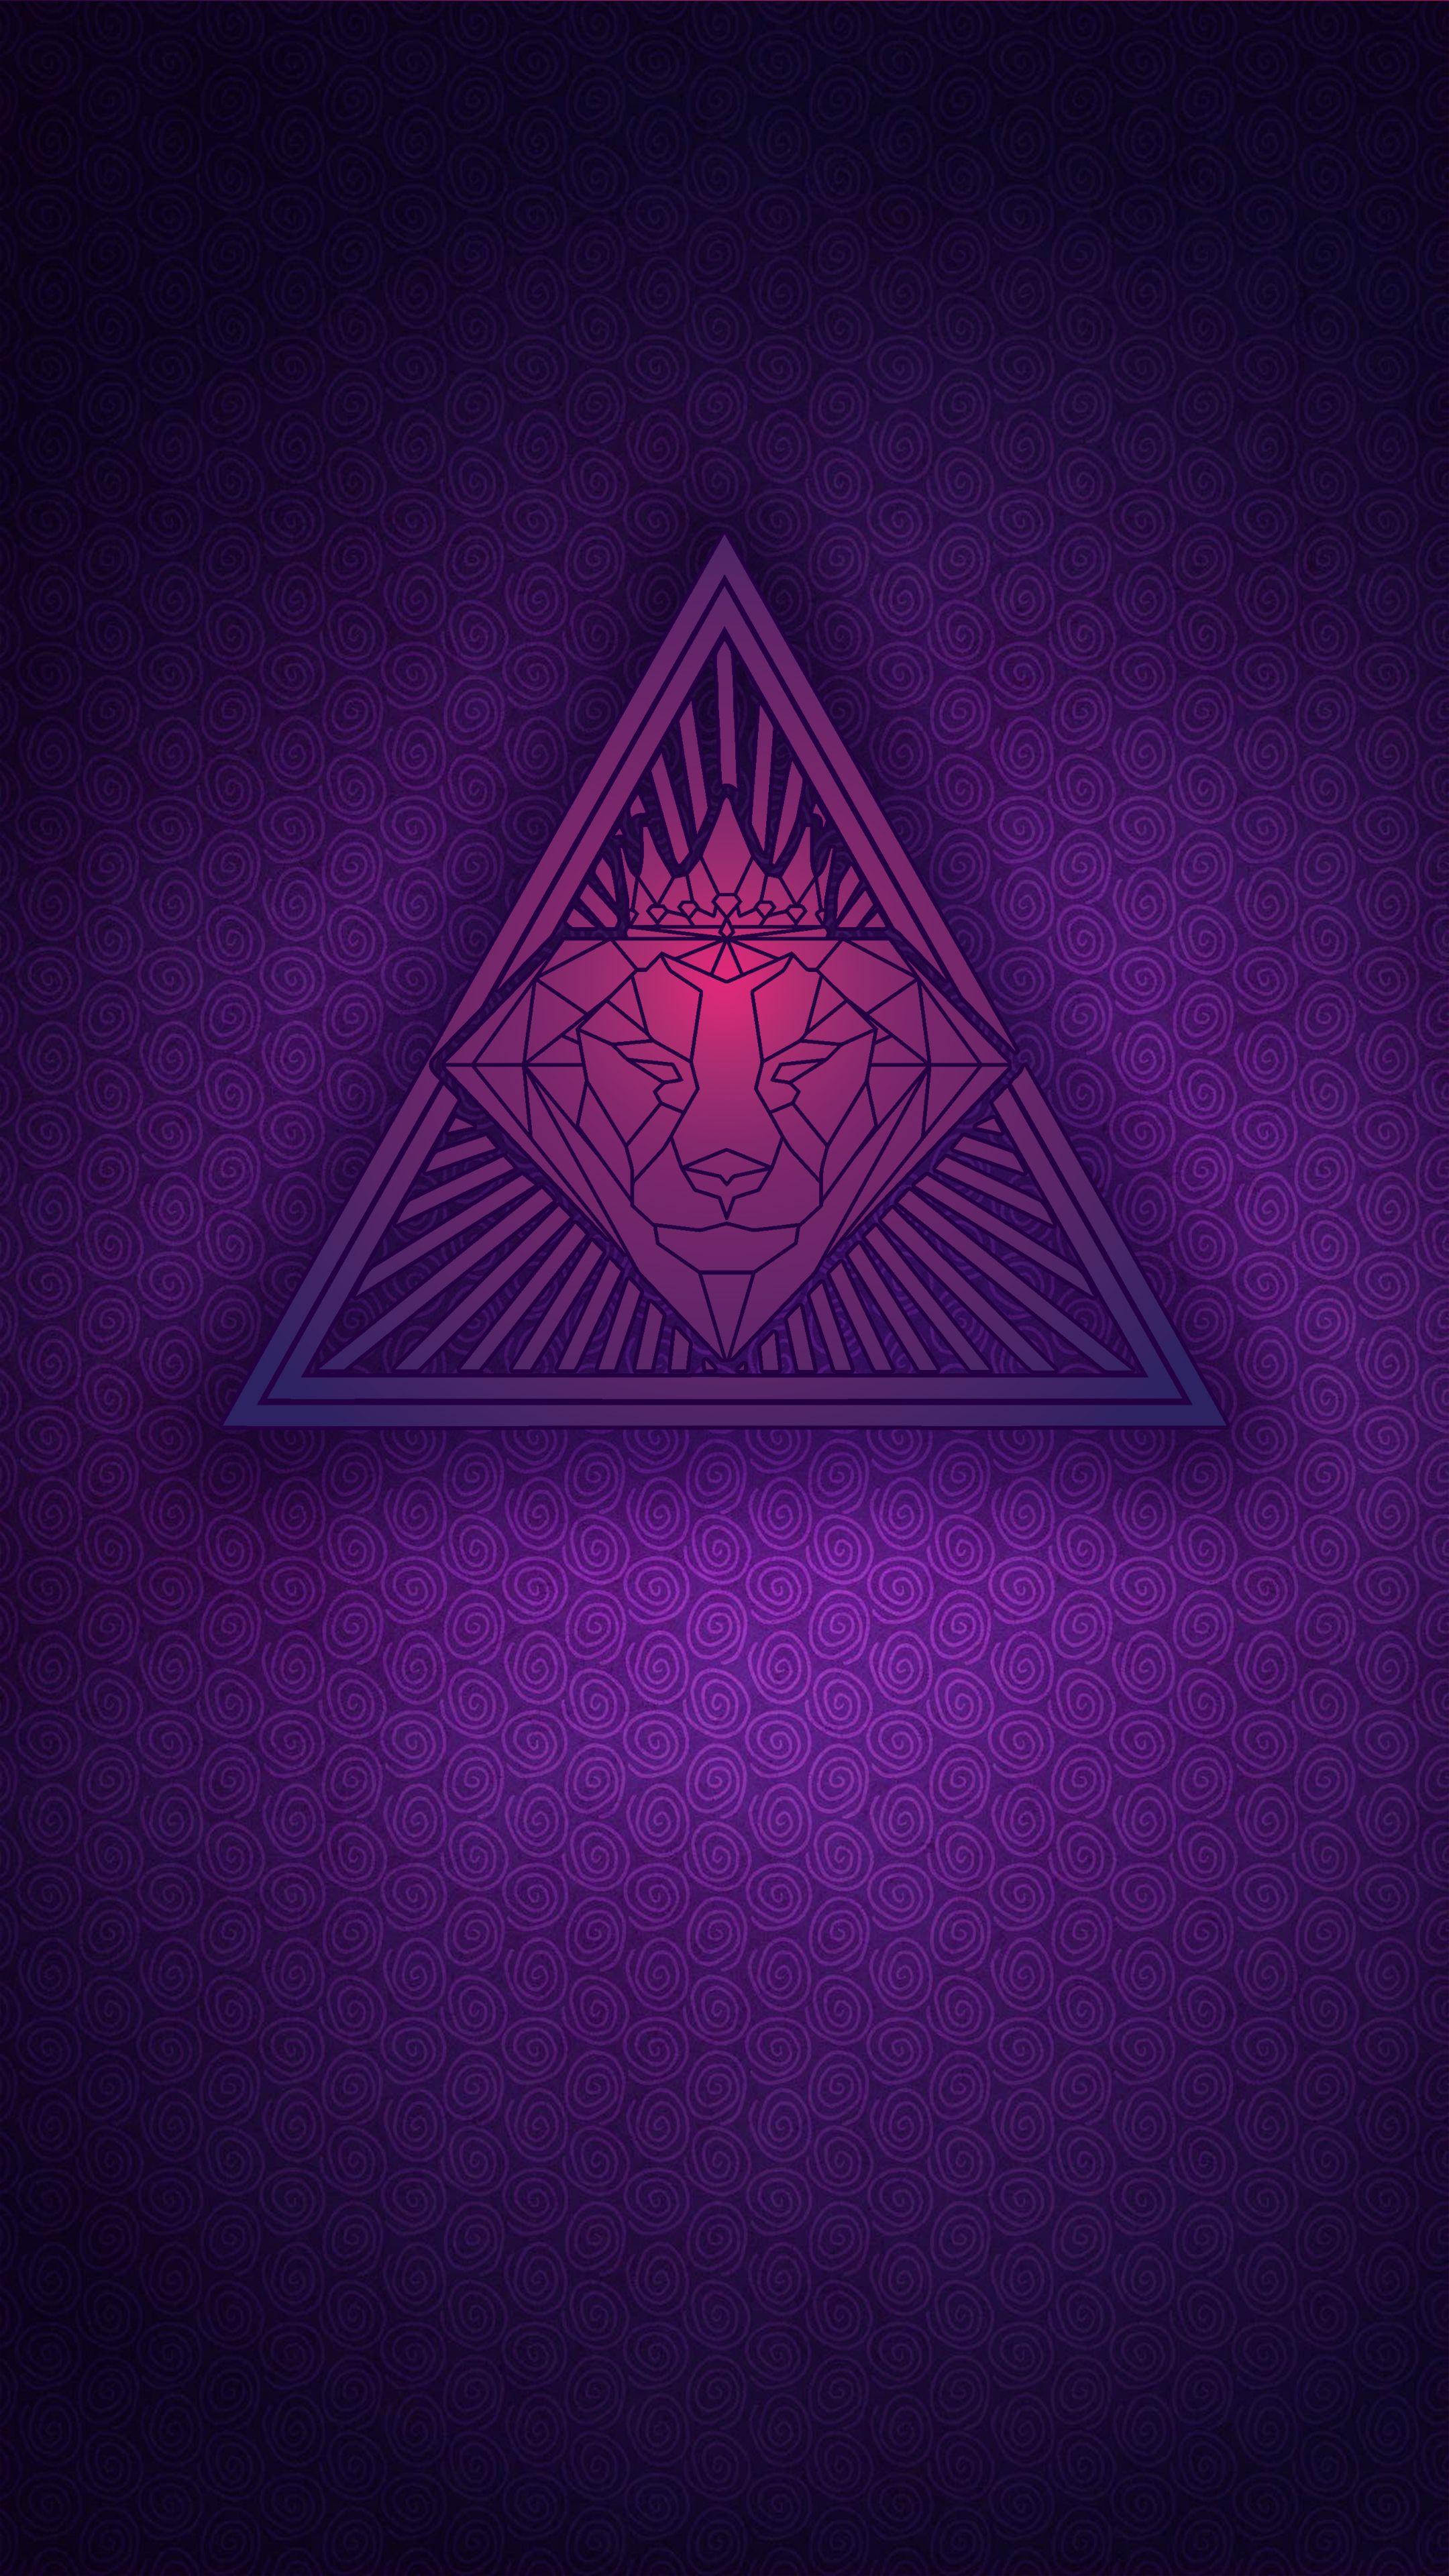 Brokerhood Pyramid Purple Wallpaper For Iphone Purple Wallpaper Iphone Iphone Wallpaper Purple Wallpaper